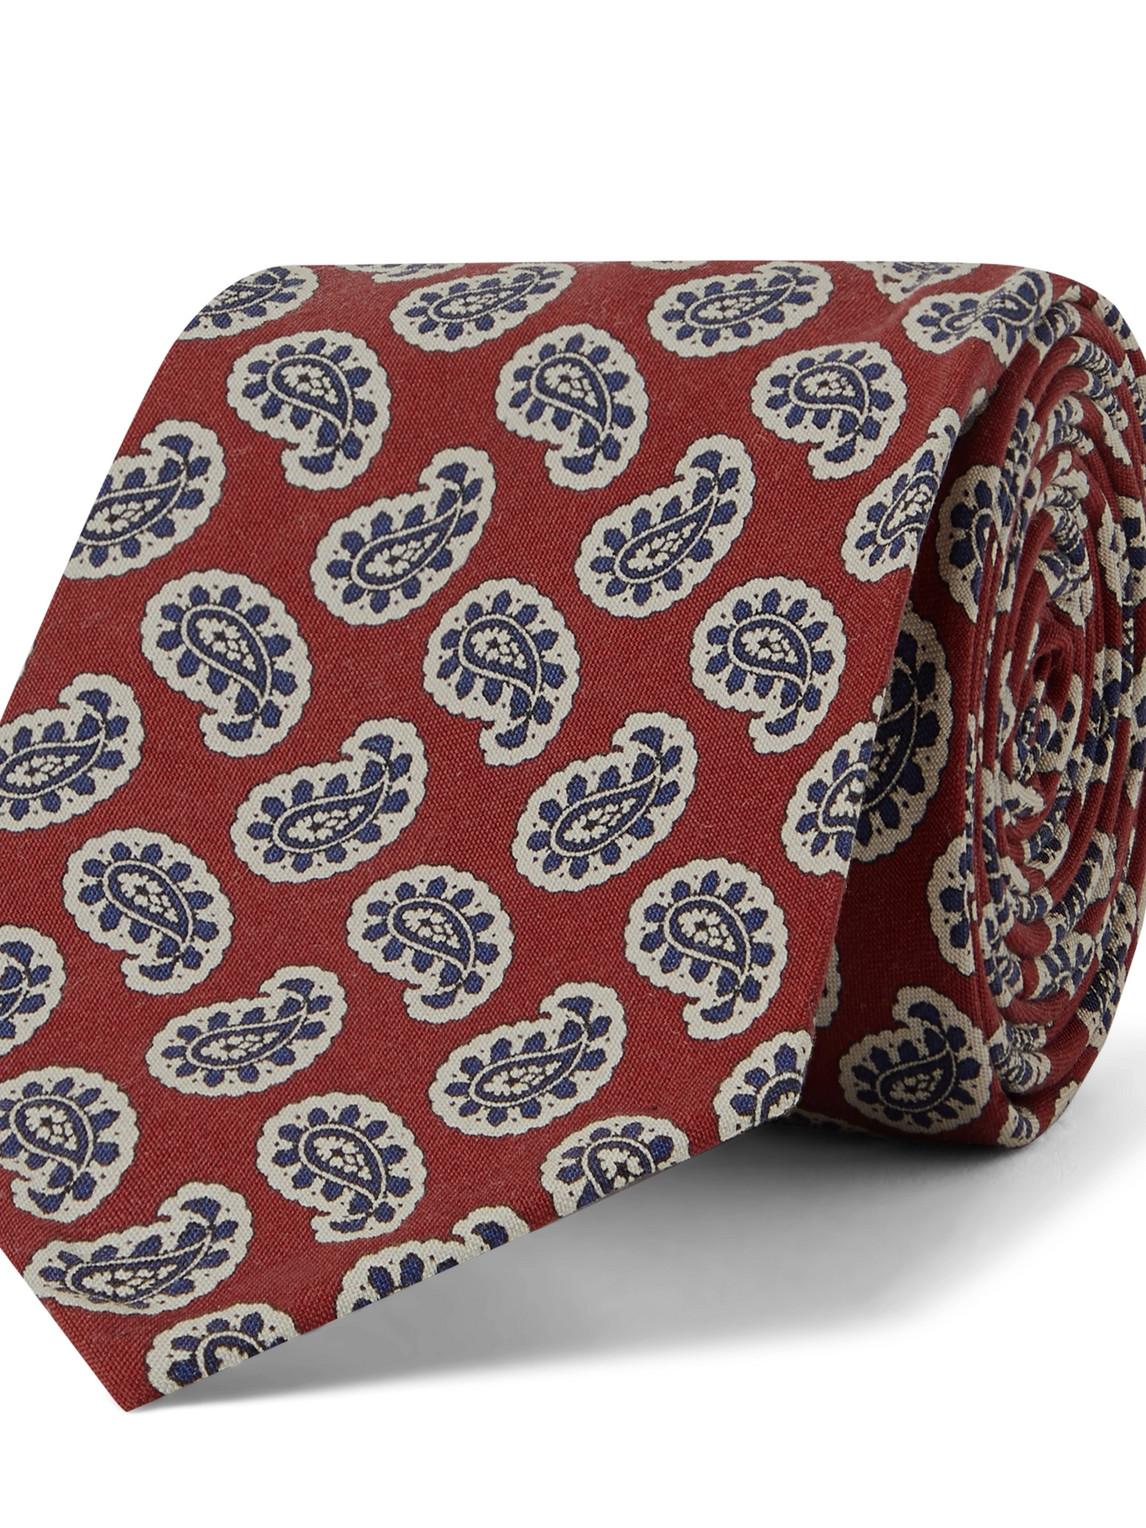 rubinacci - 8cm paisley-print silk tie - men - red - one size